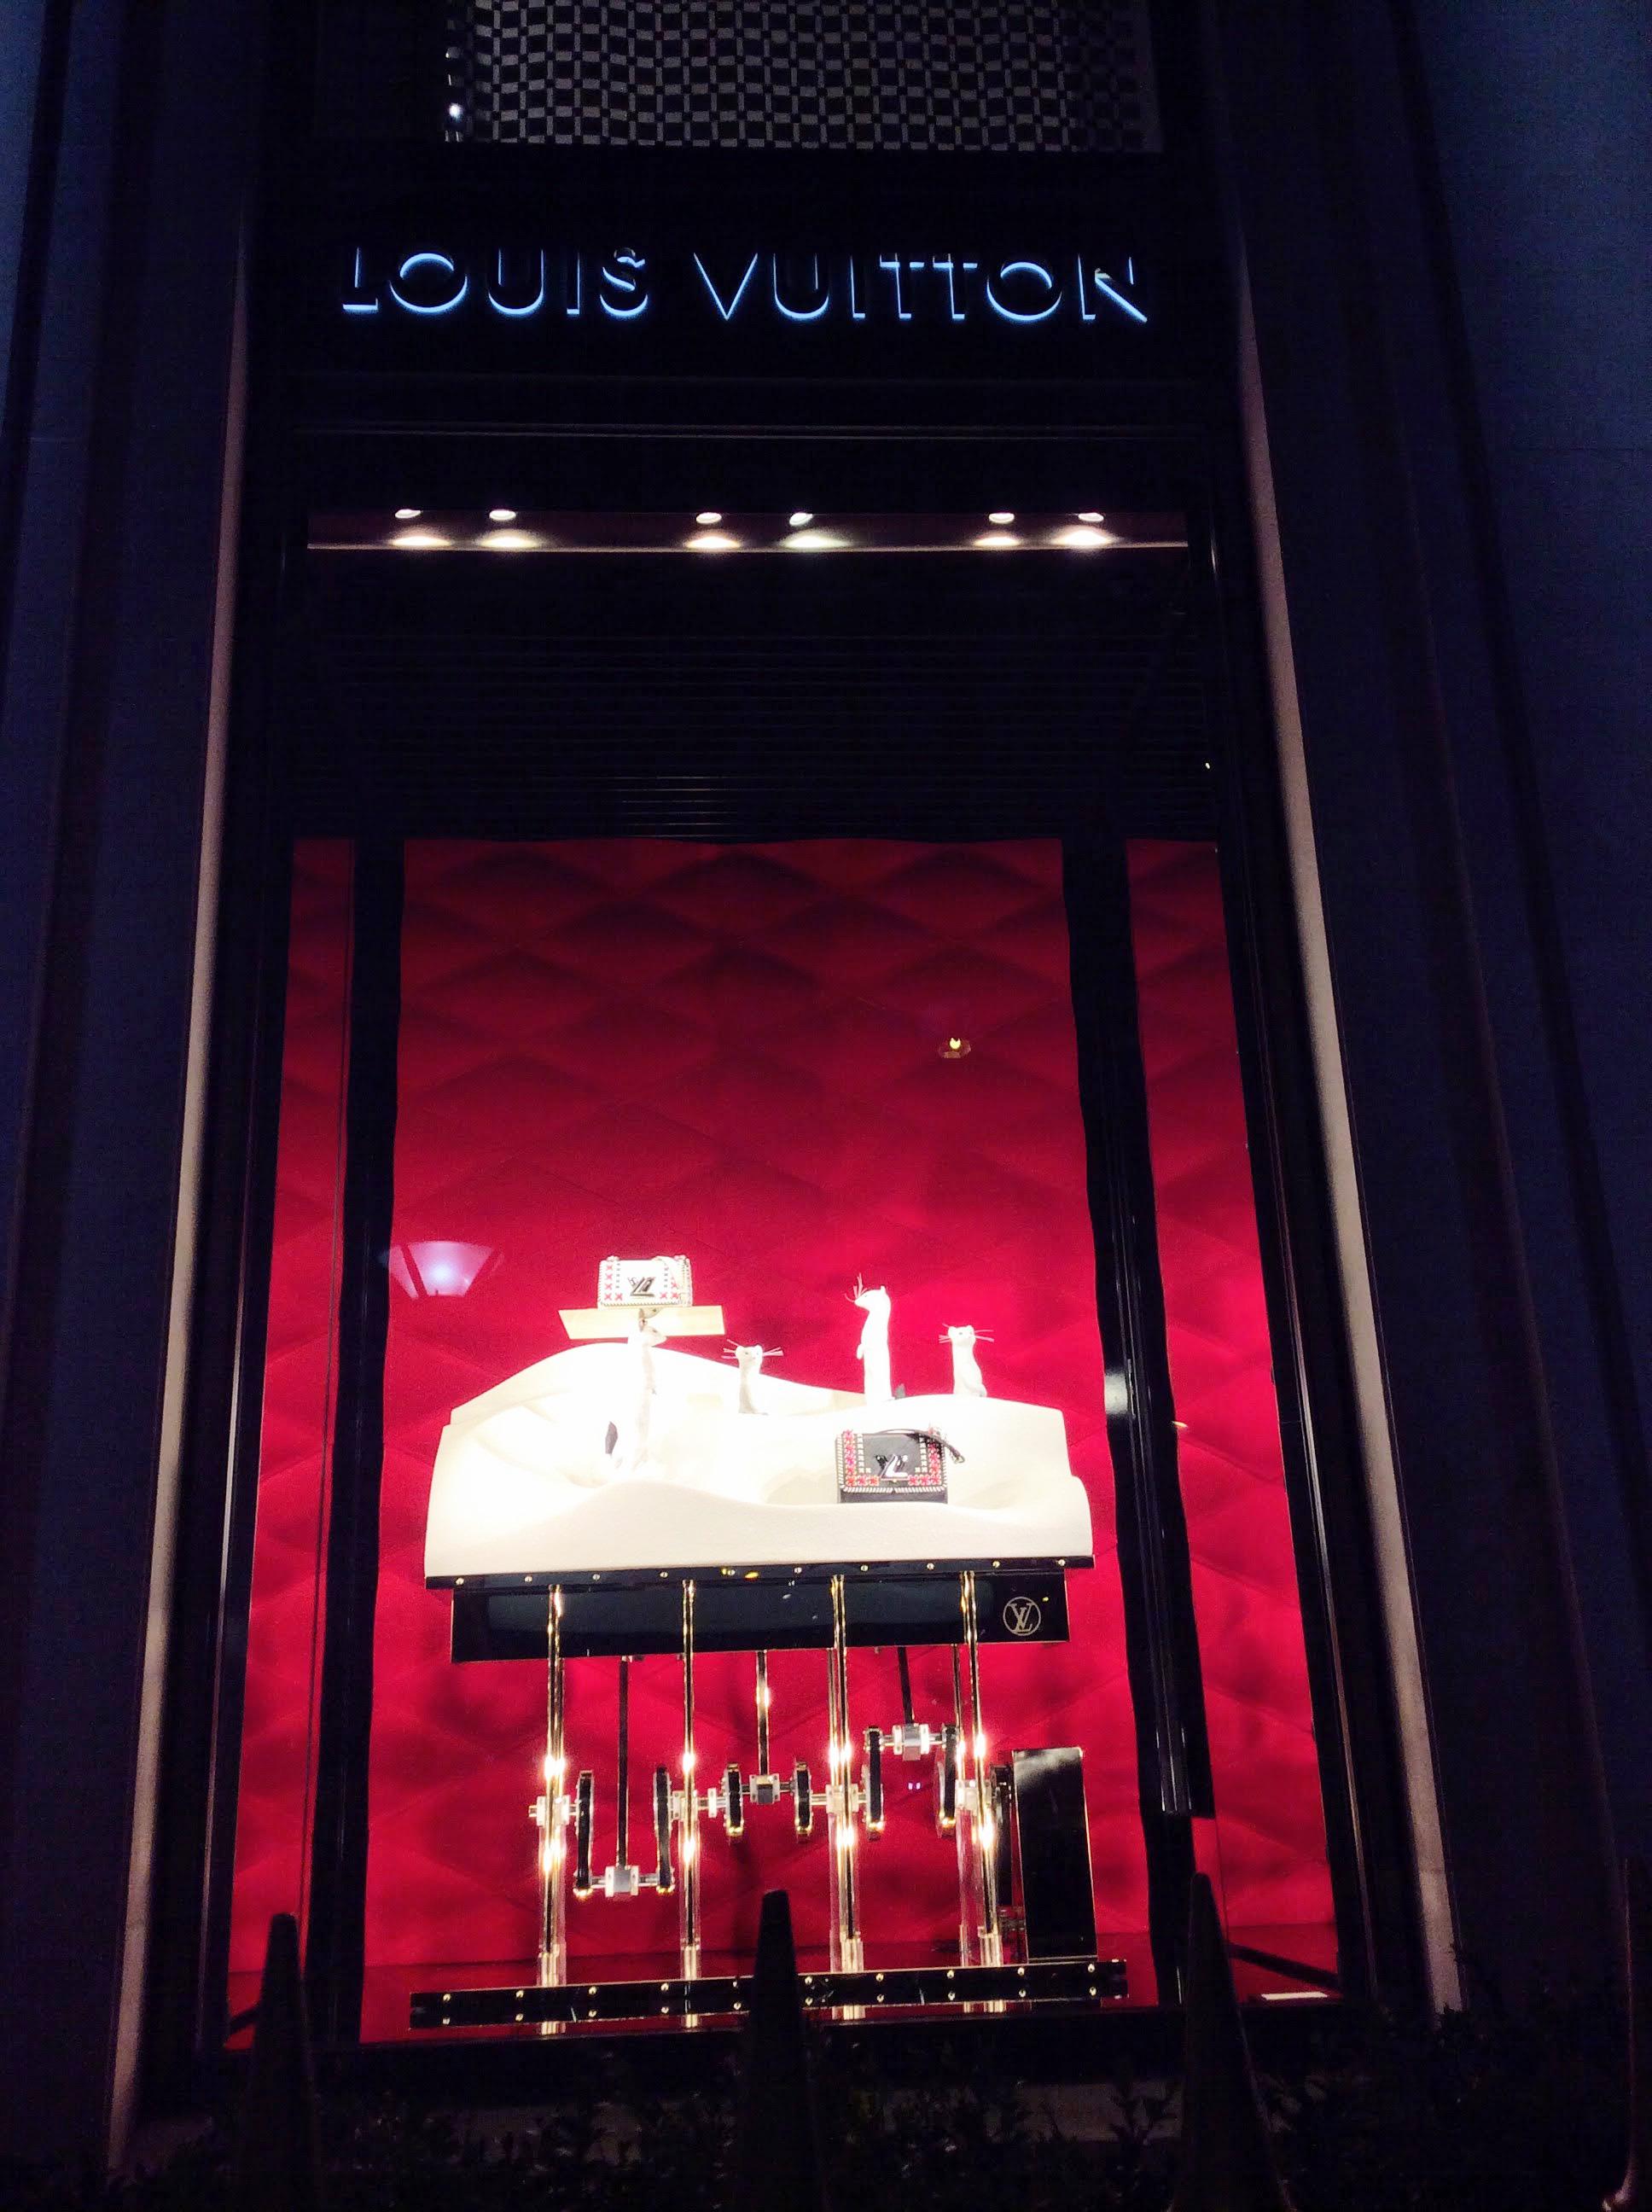 Avenue Montaigne Paris Fashion Windows - Louis Vuitton